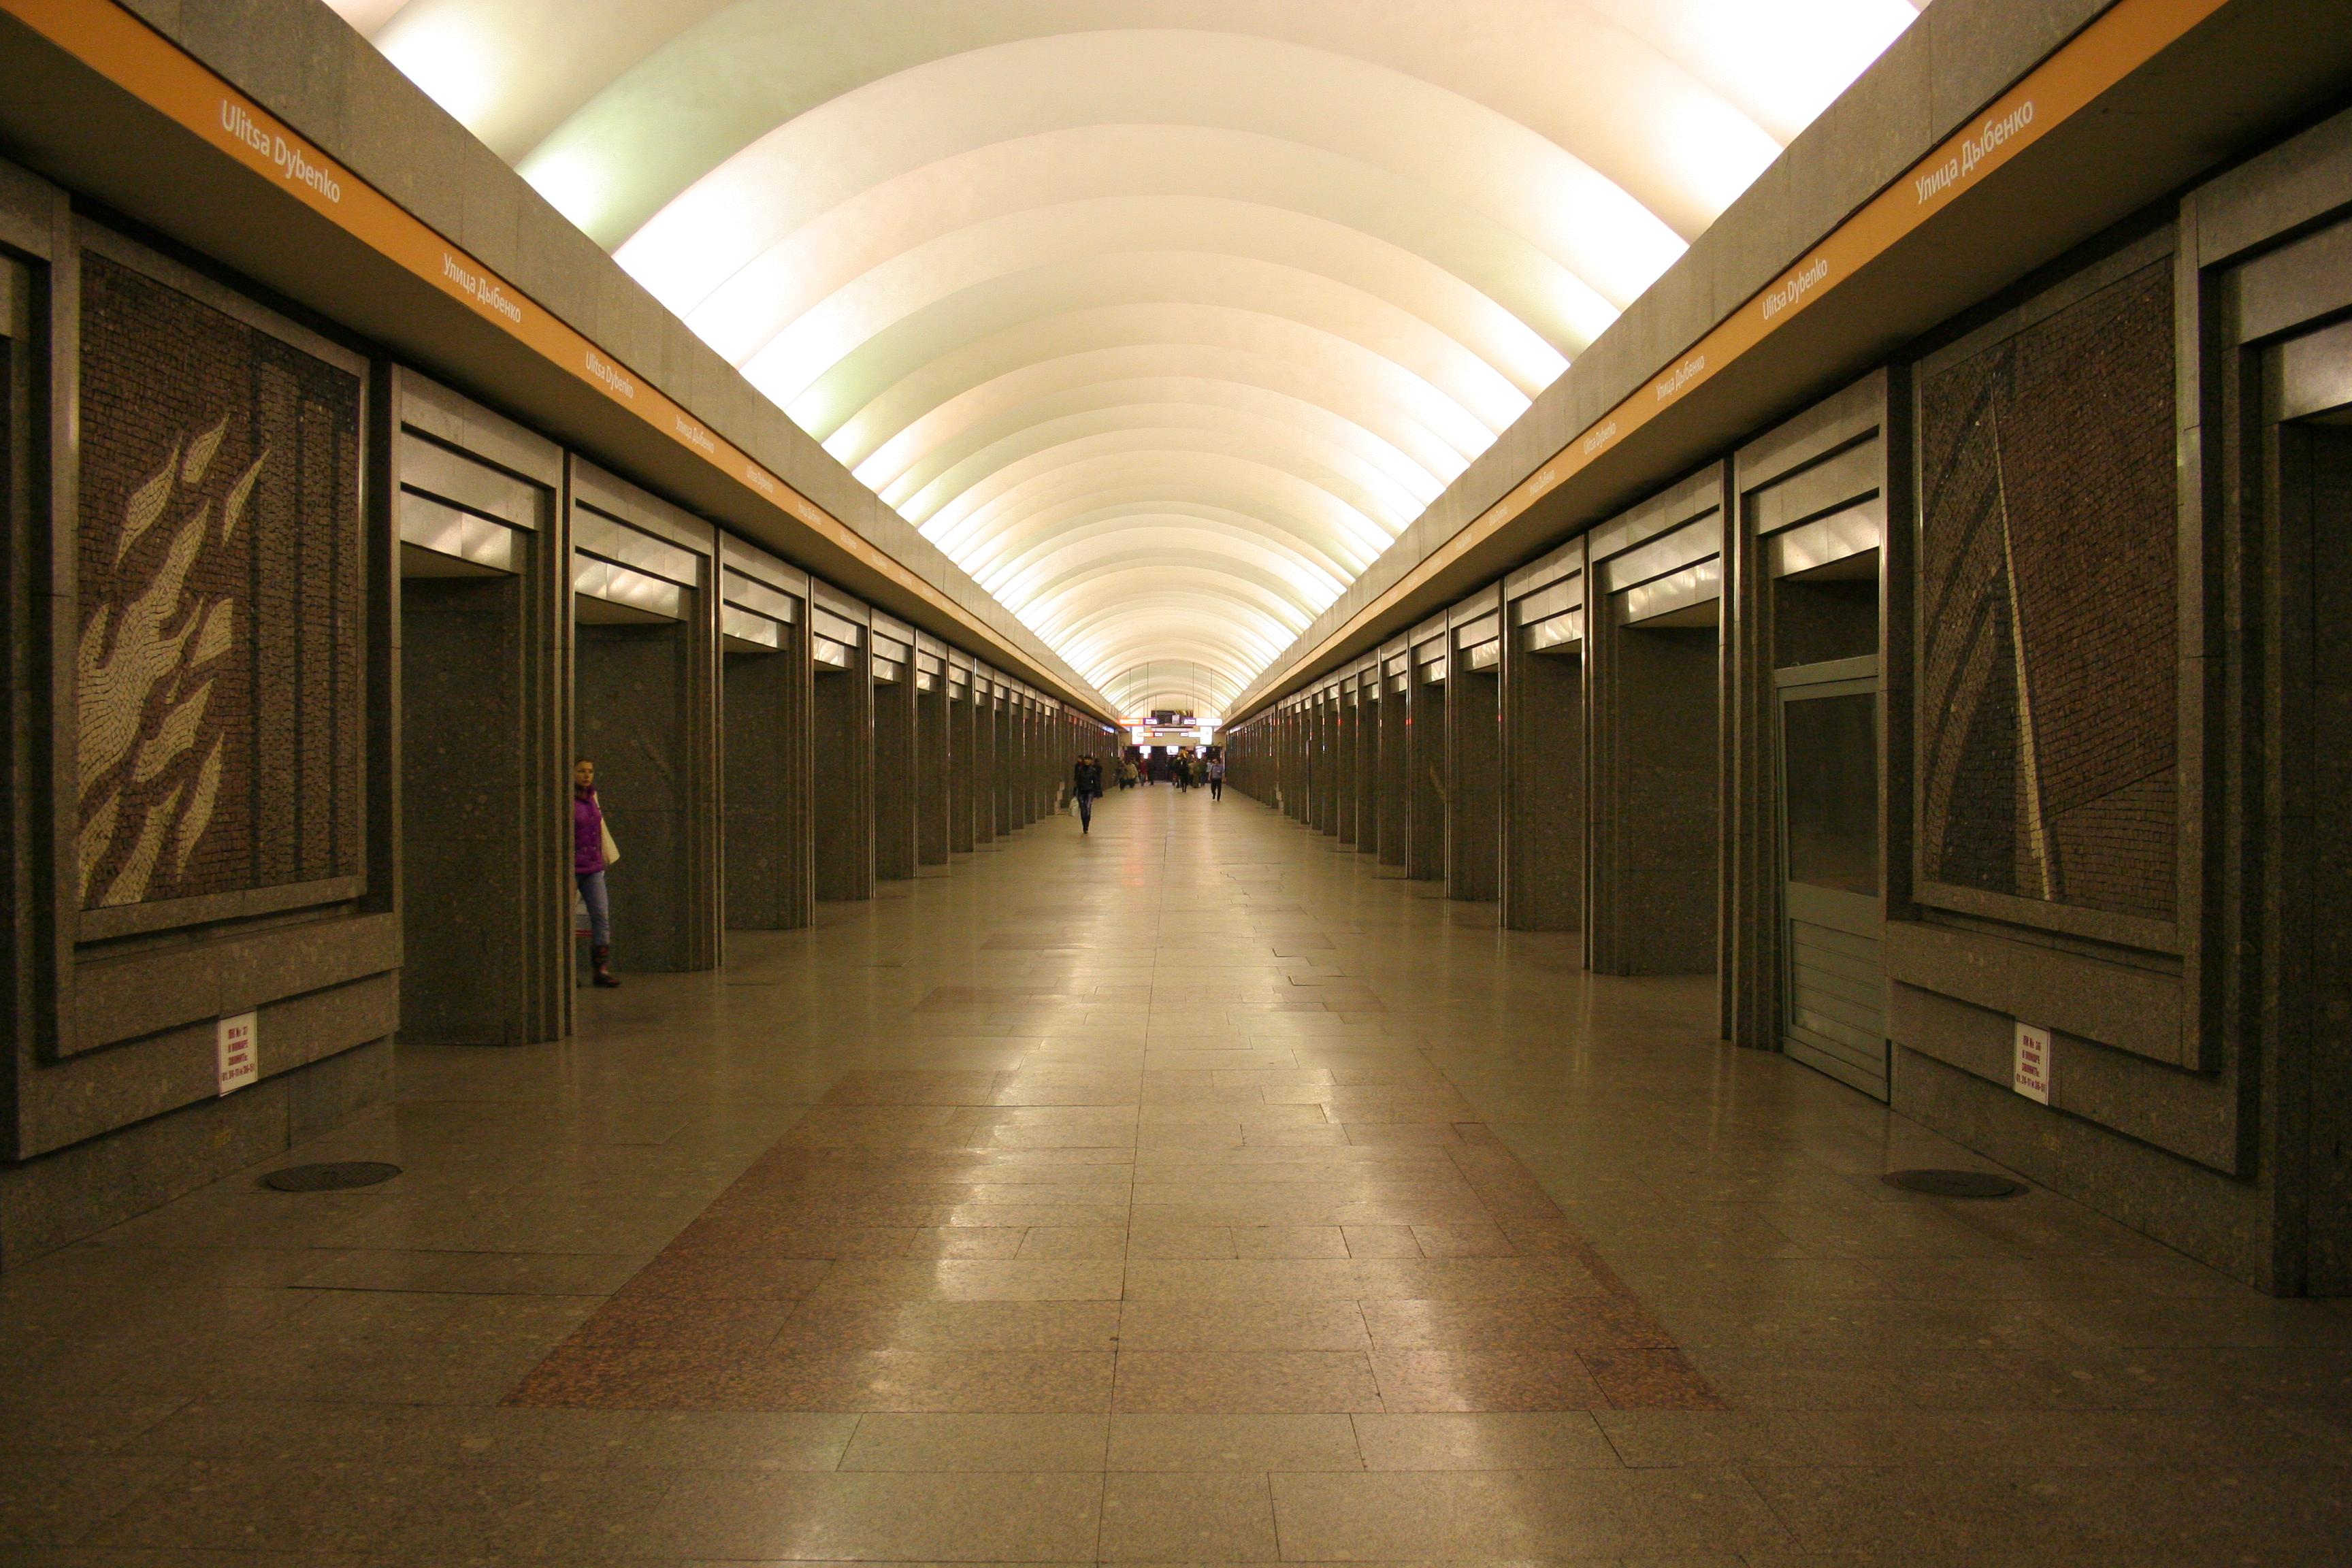 Станции метро санкт-петербурга по алфавиту